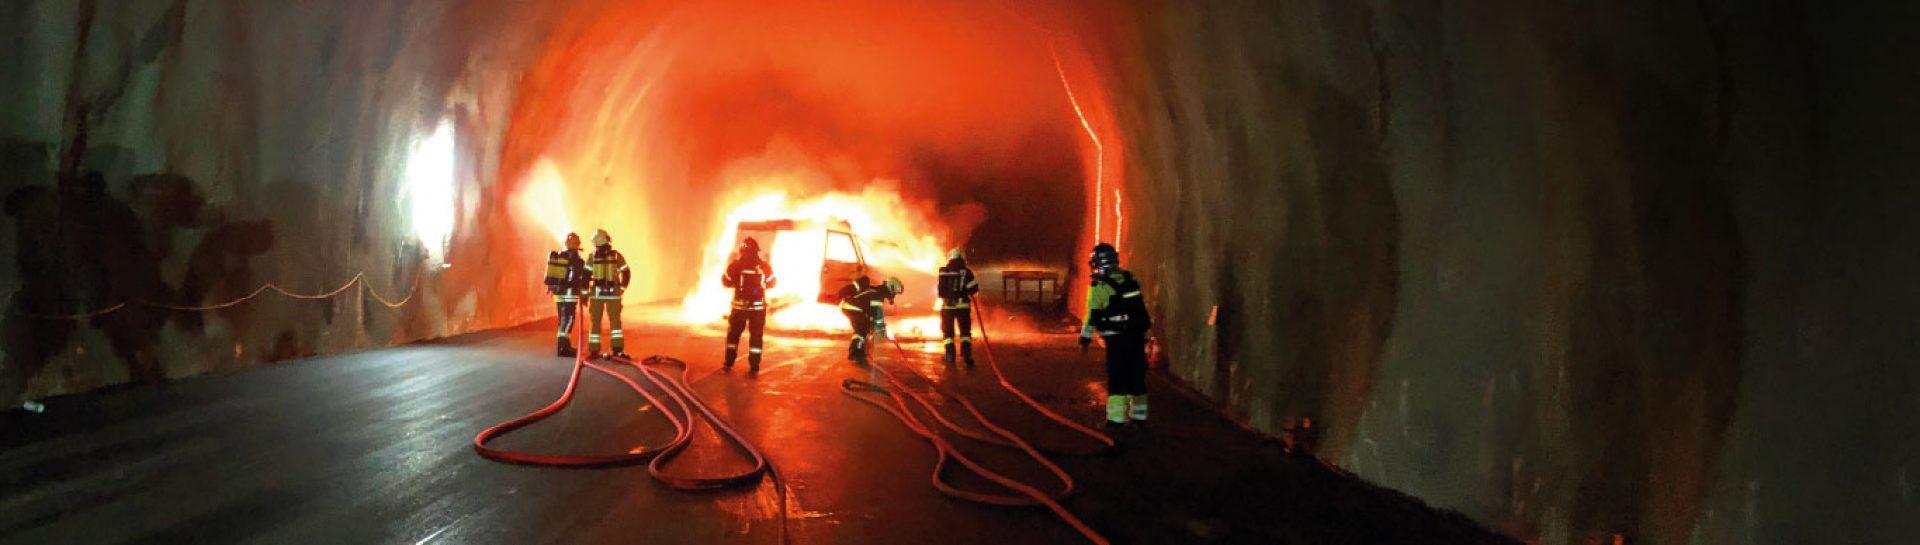 FireTec GmbH